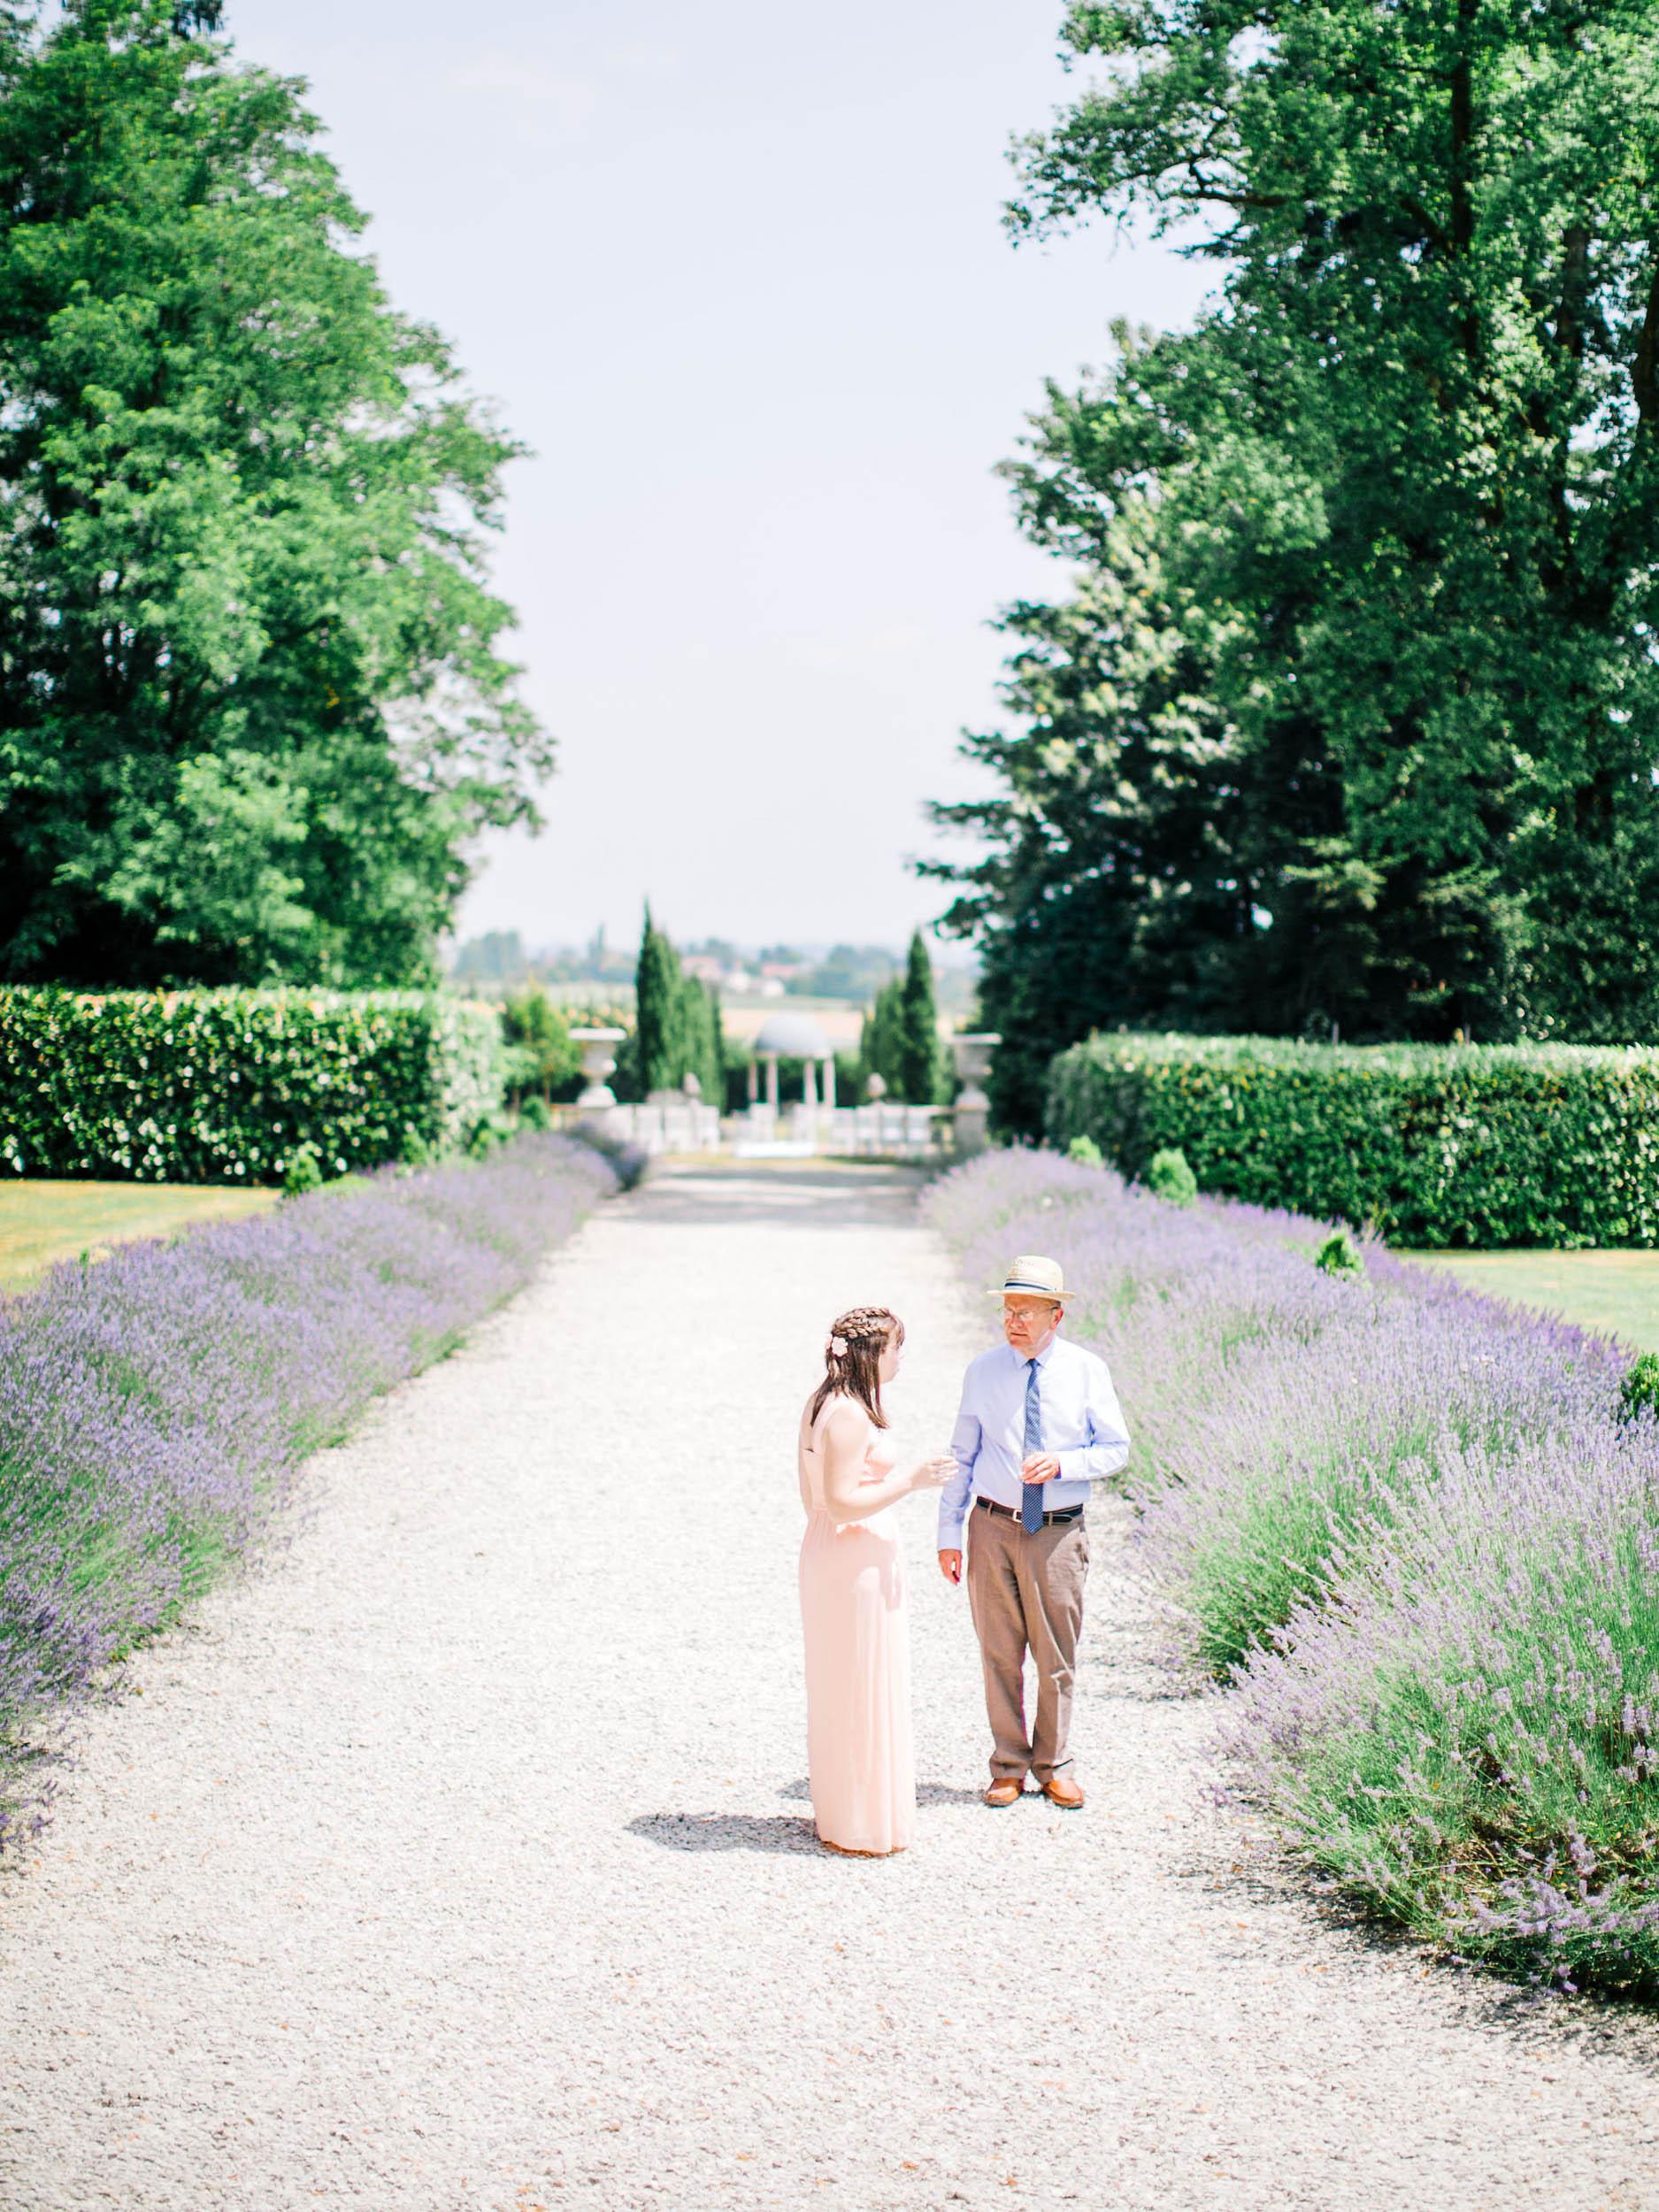 Amy O'Boyle Photography- Destination & UK Fine Art Film Wedding Photographer- Chateau La Durantie Wedding-8.jpg